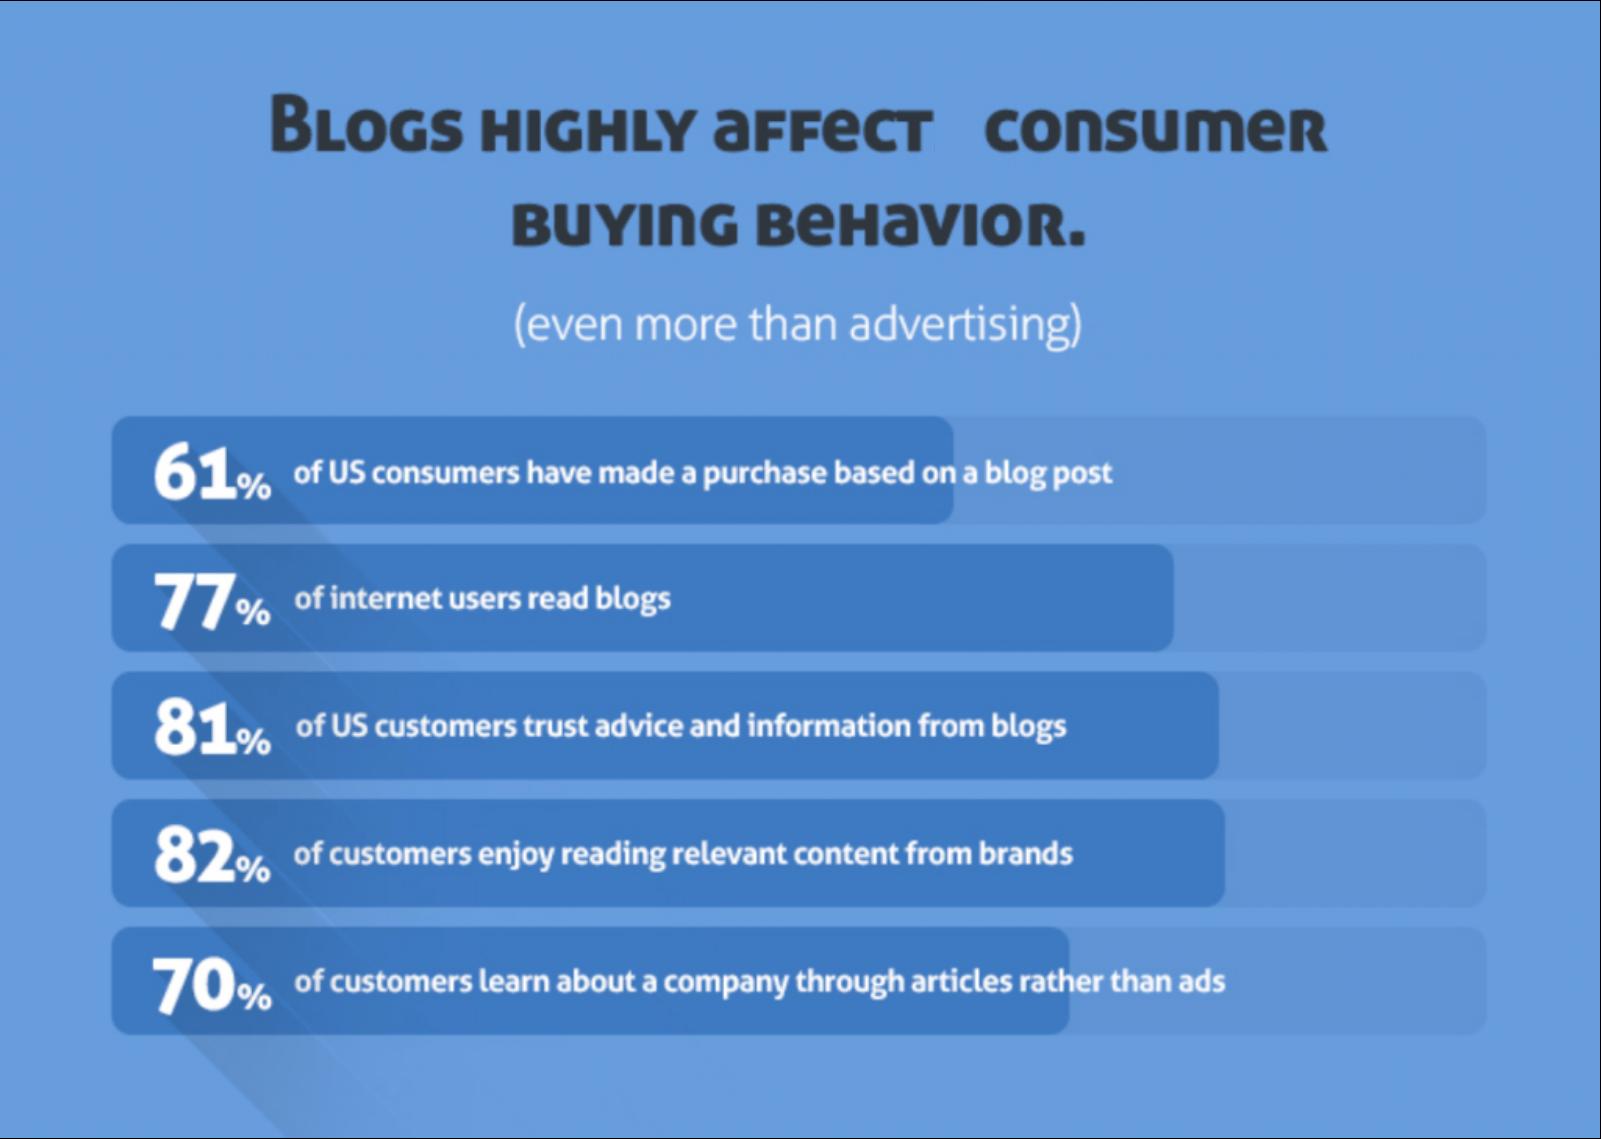 Blogs affect consumer behavior edited